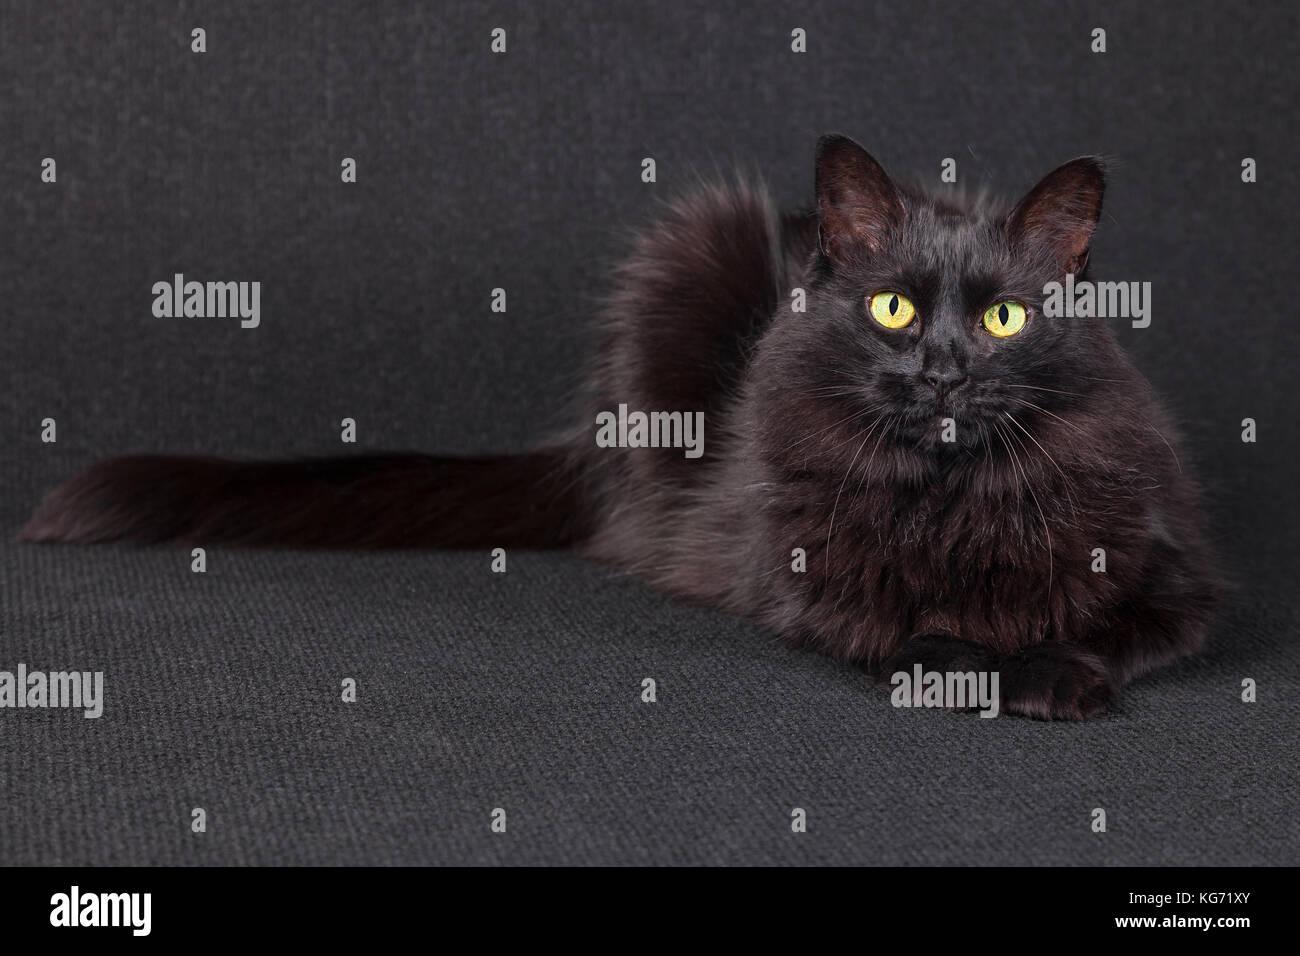 Sleepy black cat lying down facing the camera on a dark background. Long hair Turkish Angora breed. Adult female. - Stock Image